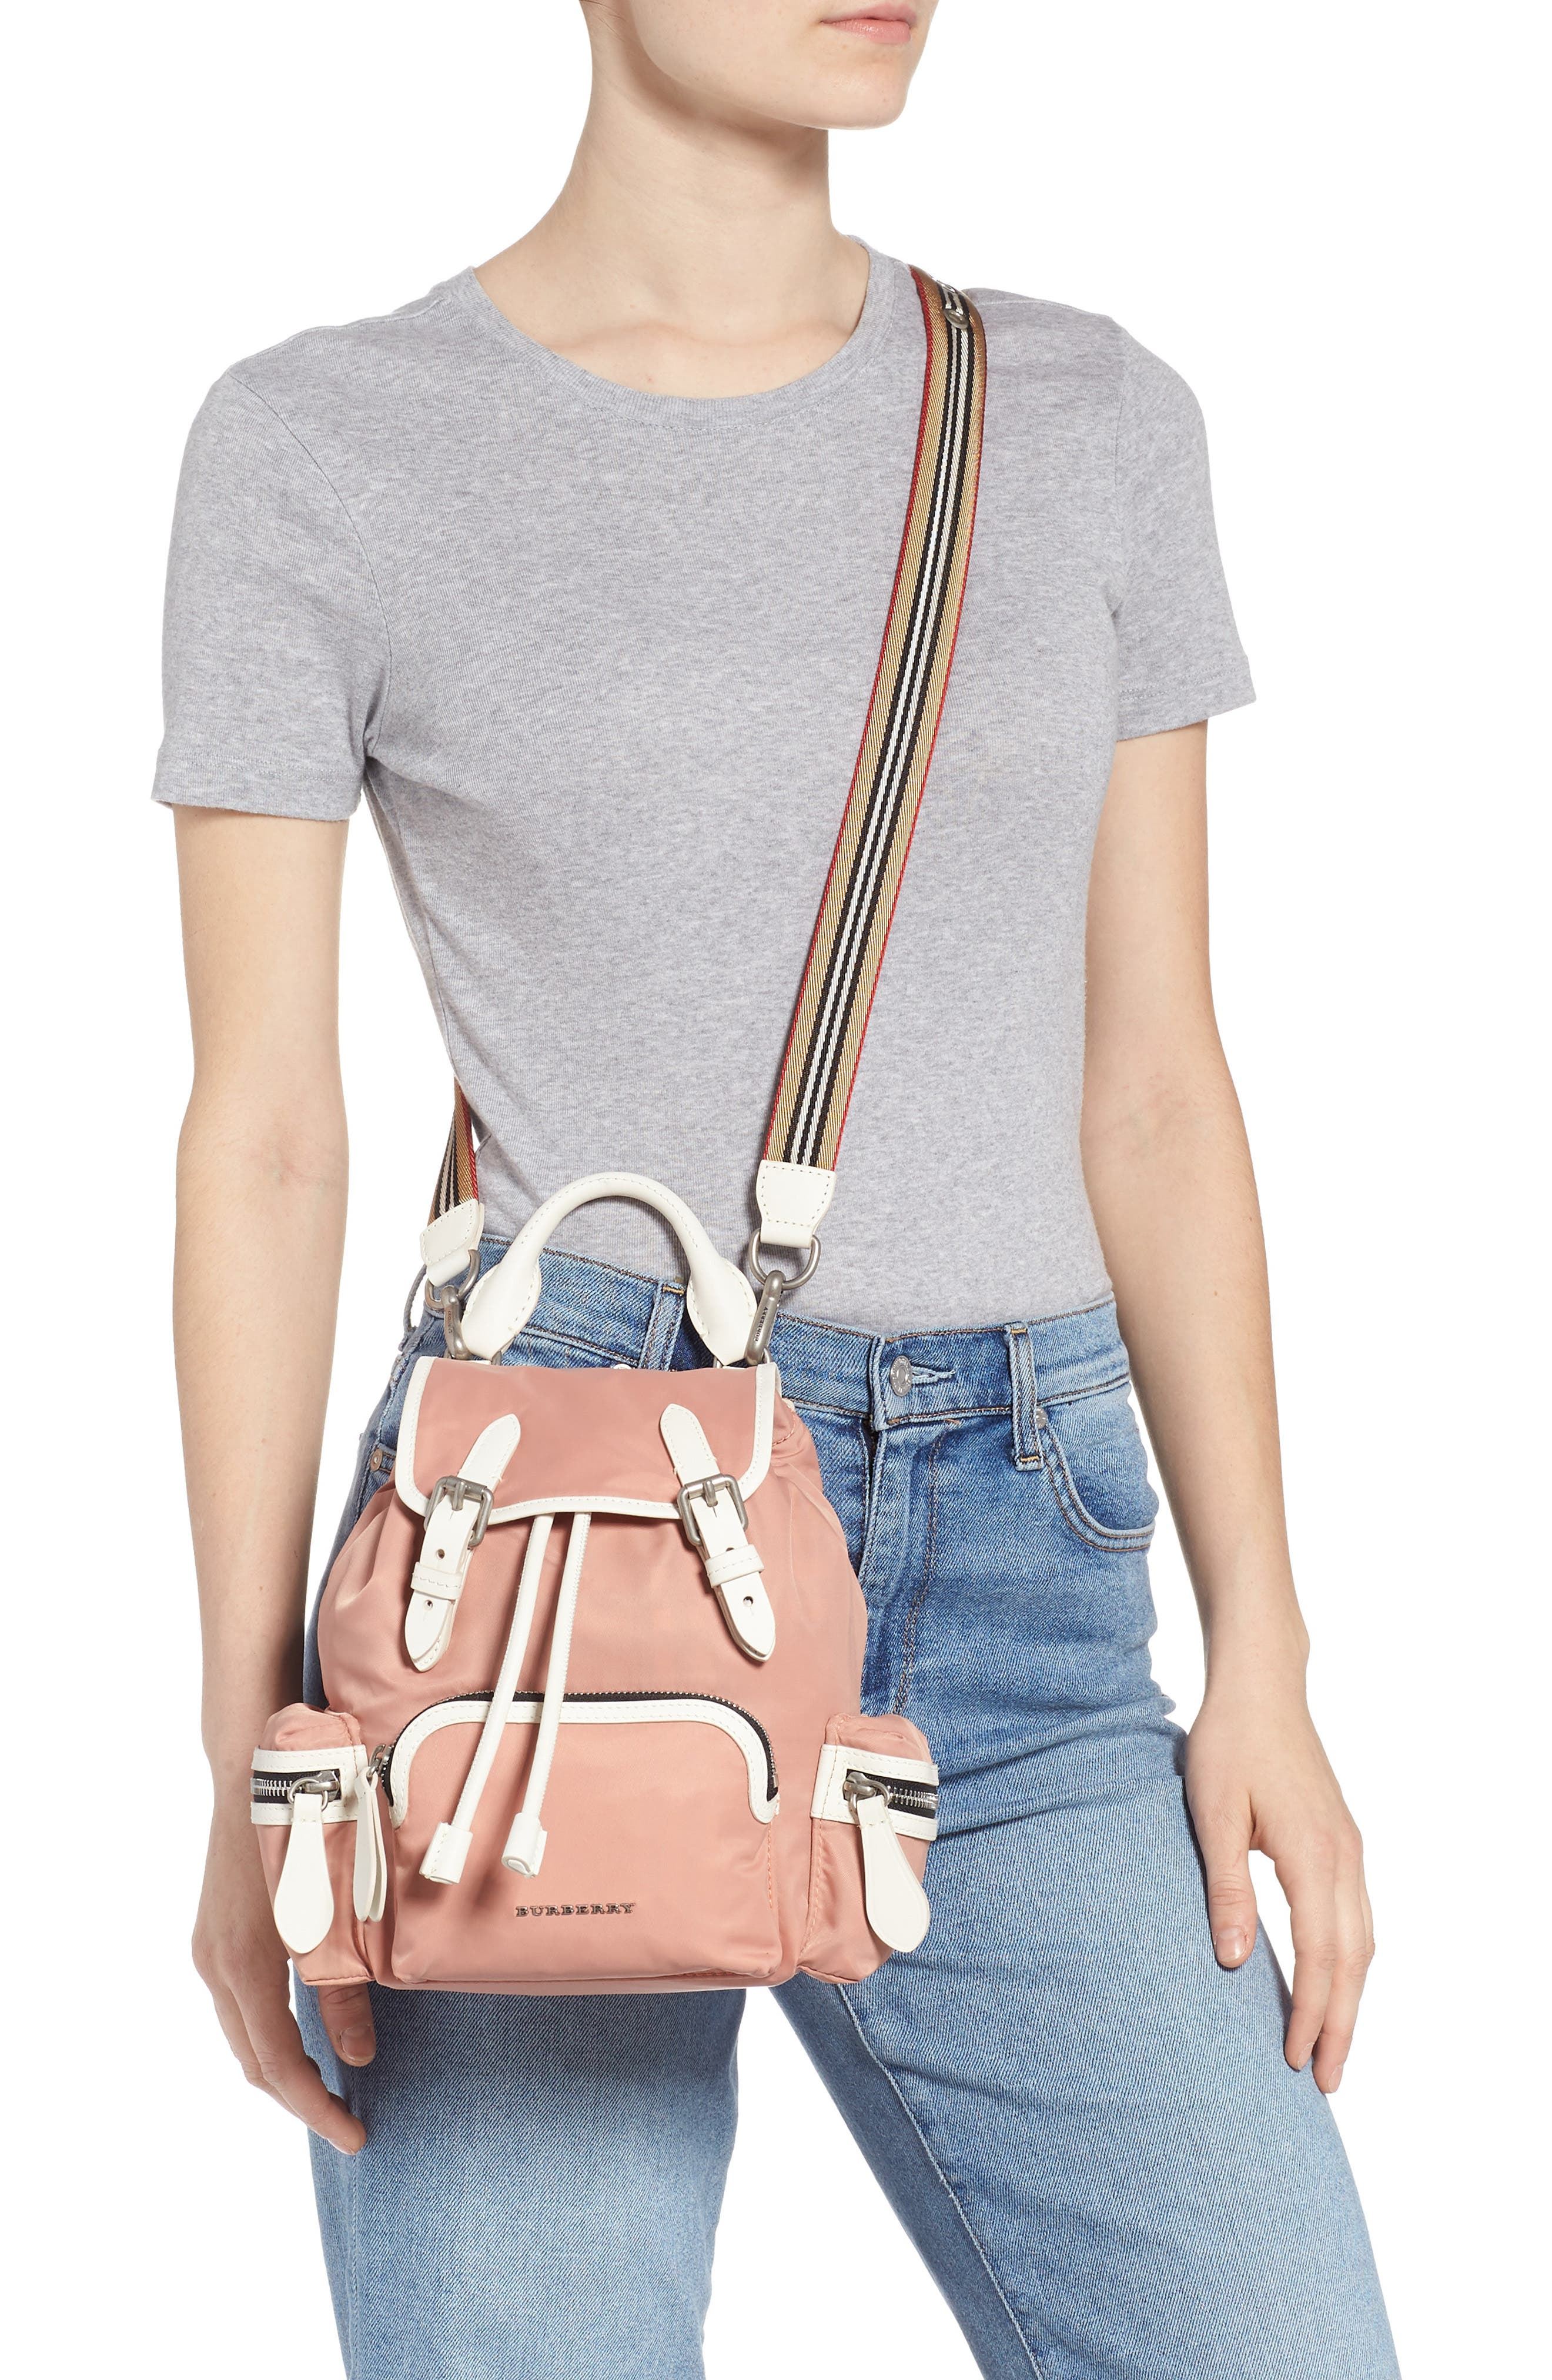 Small Rucksack Nylon Backpack,                             Alternate thumbnail 3, color,                             POWDER PINK